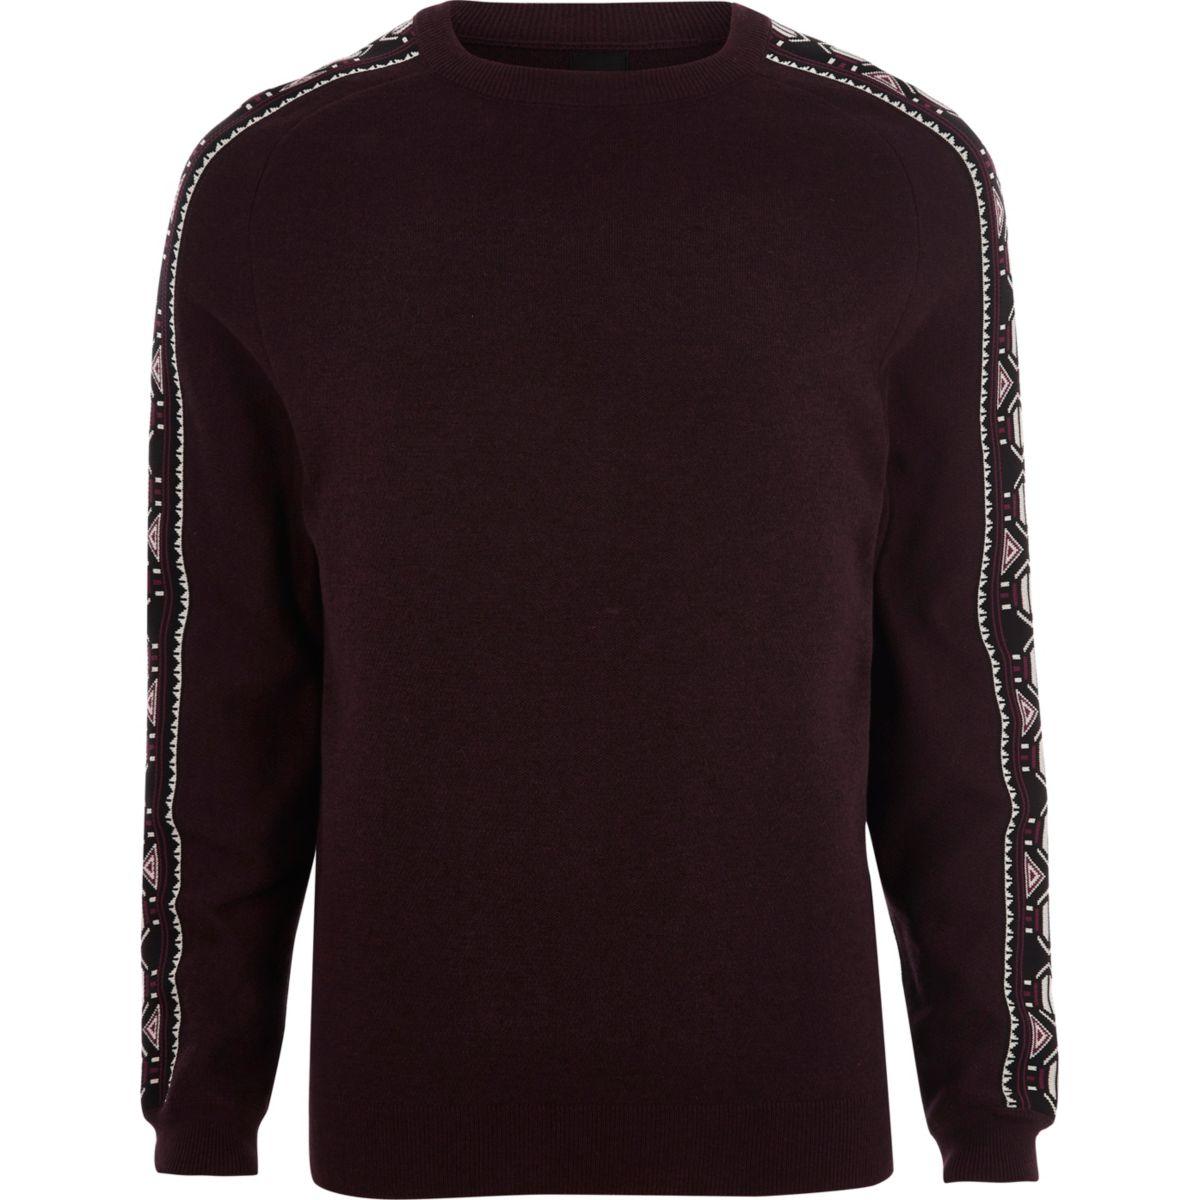 Dark red aztec sleeve knit sweater